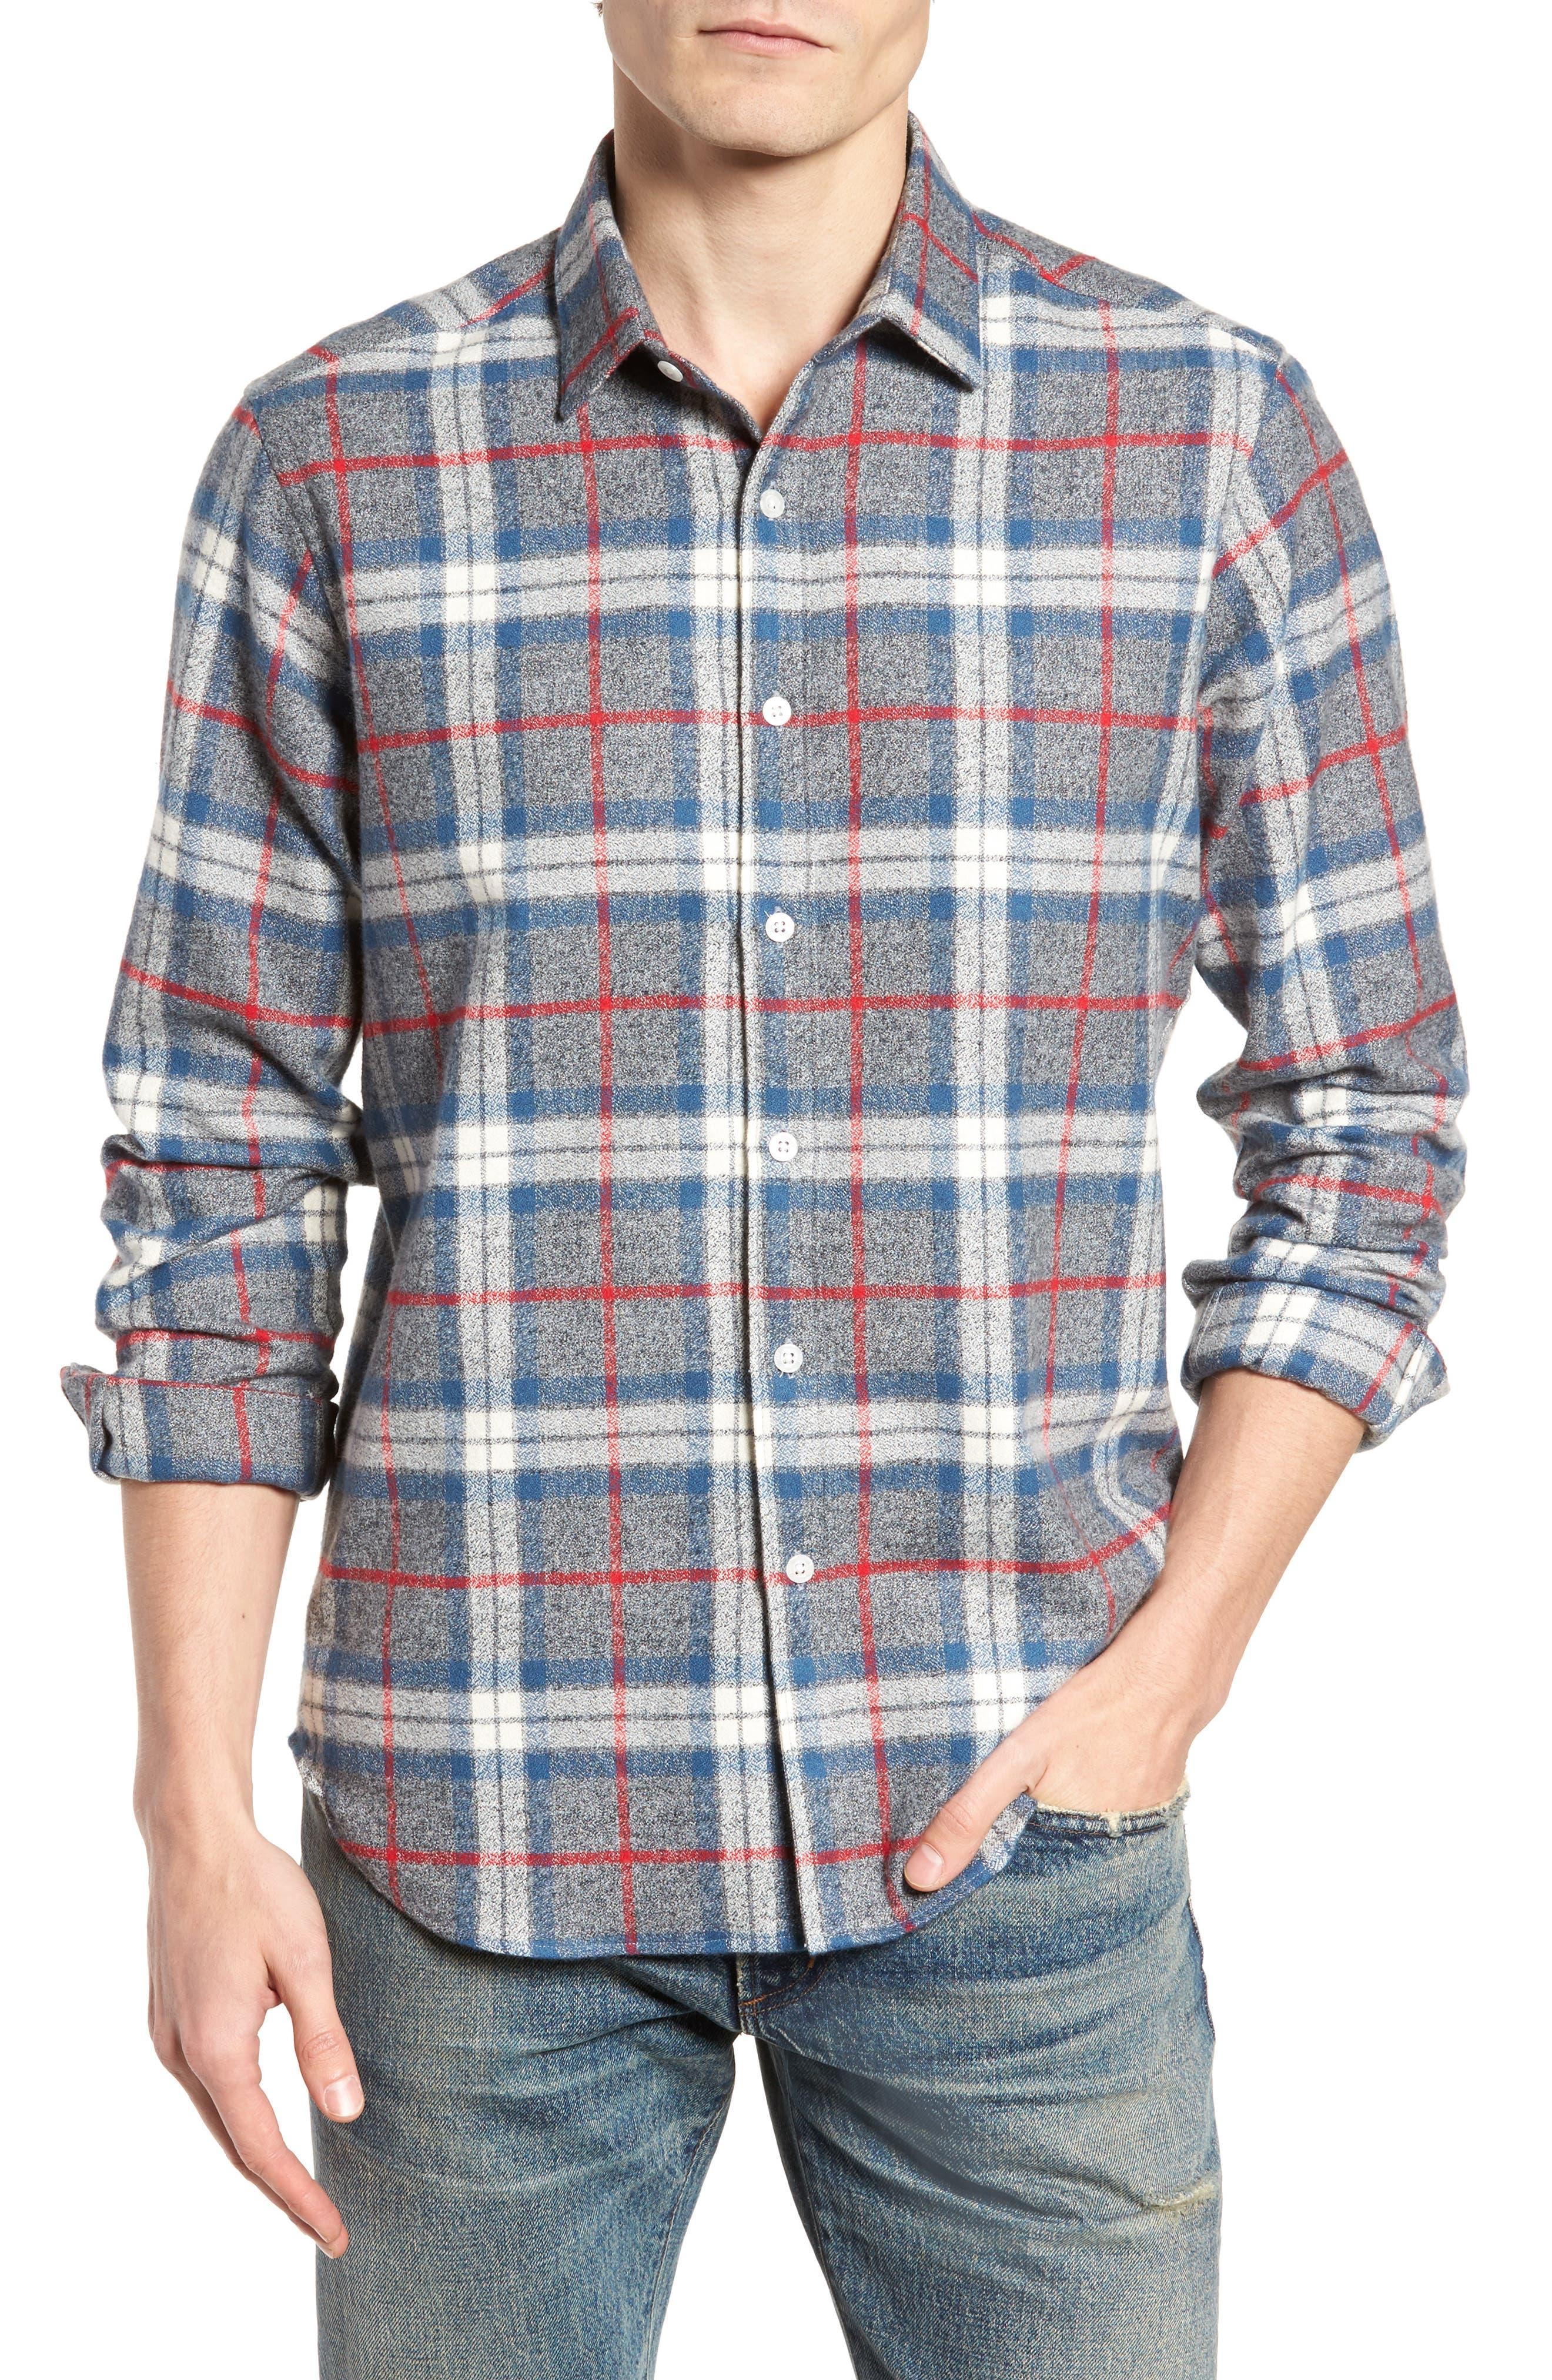 Main Image - Jeff Brattleb Slim Fit Plaid Sport Shirt